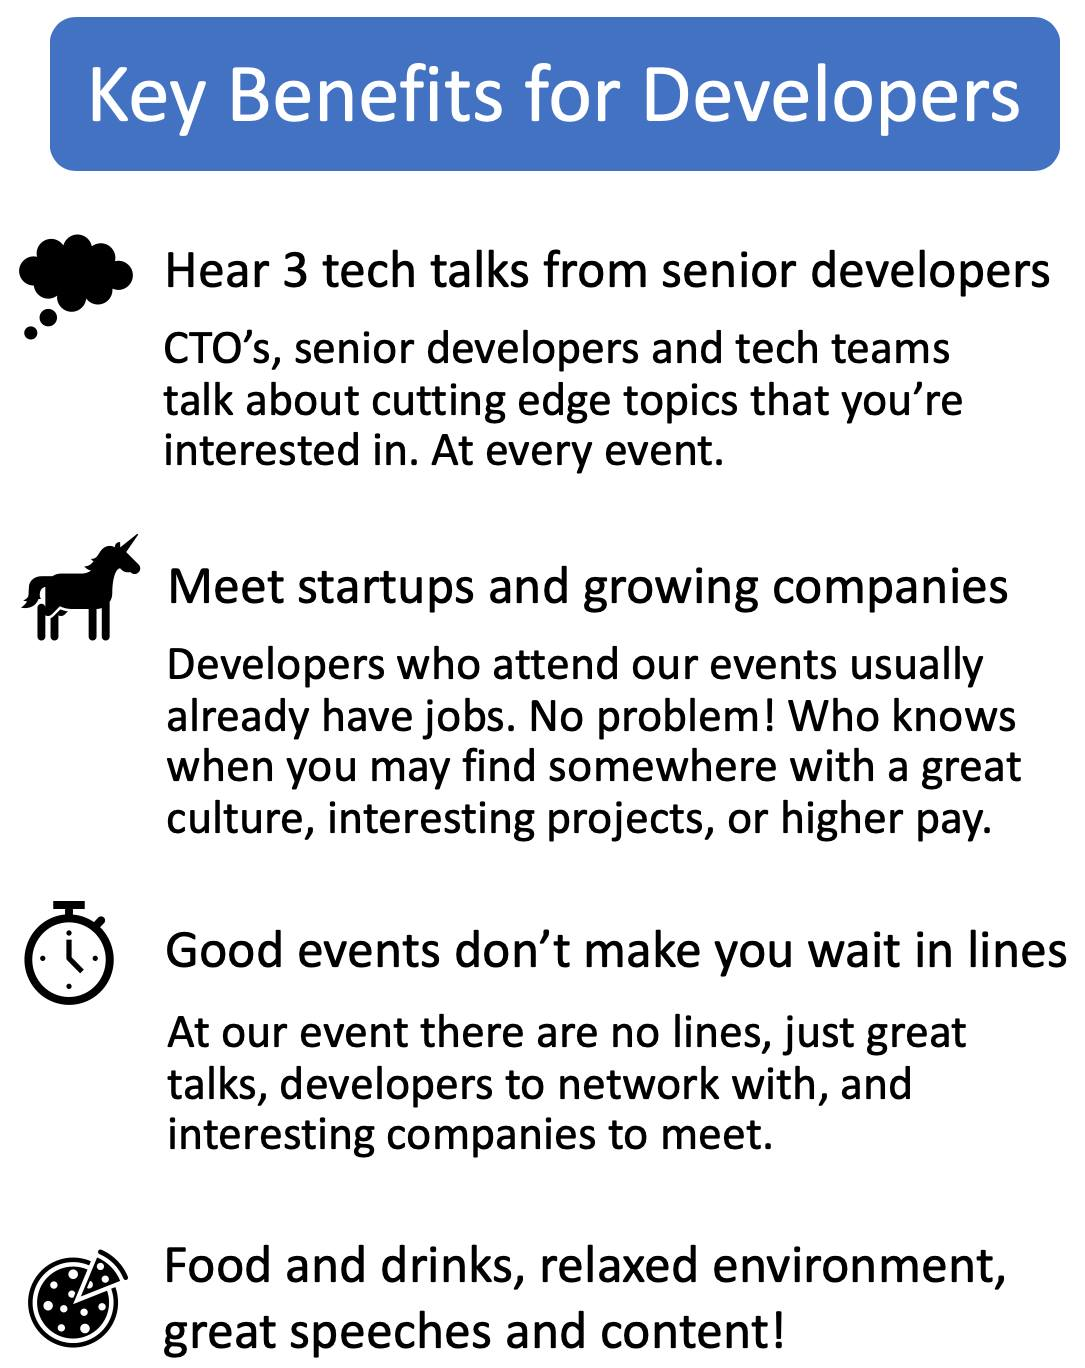 key benefits developers.jpg